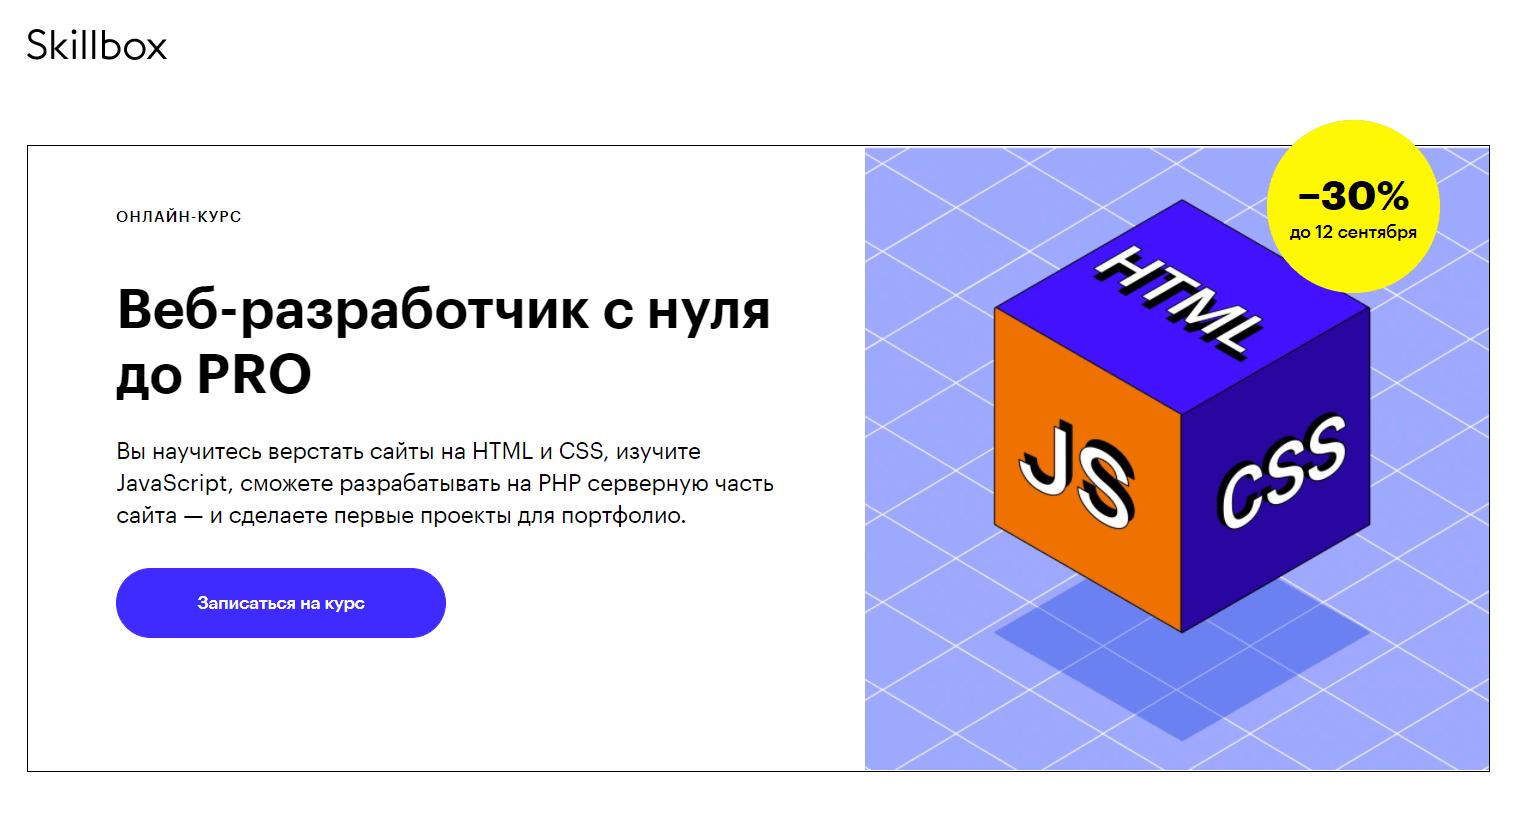 Веб-разработчик с нуля до ПРО